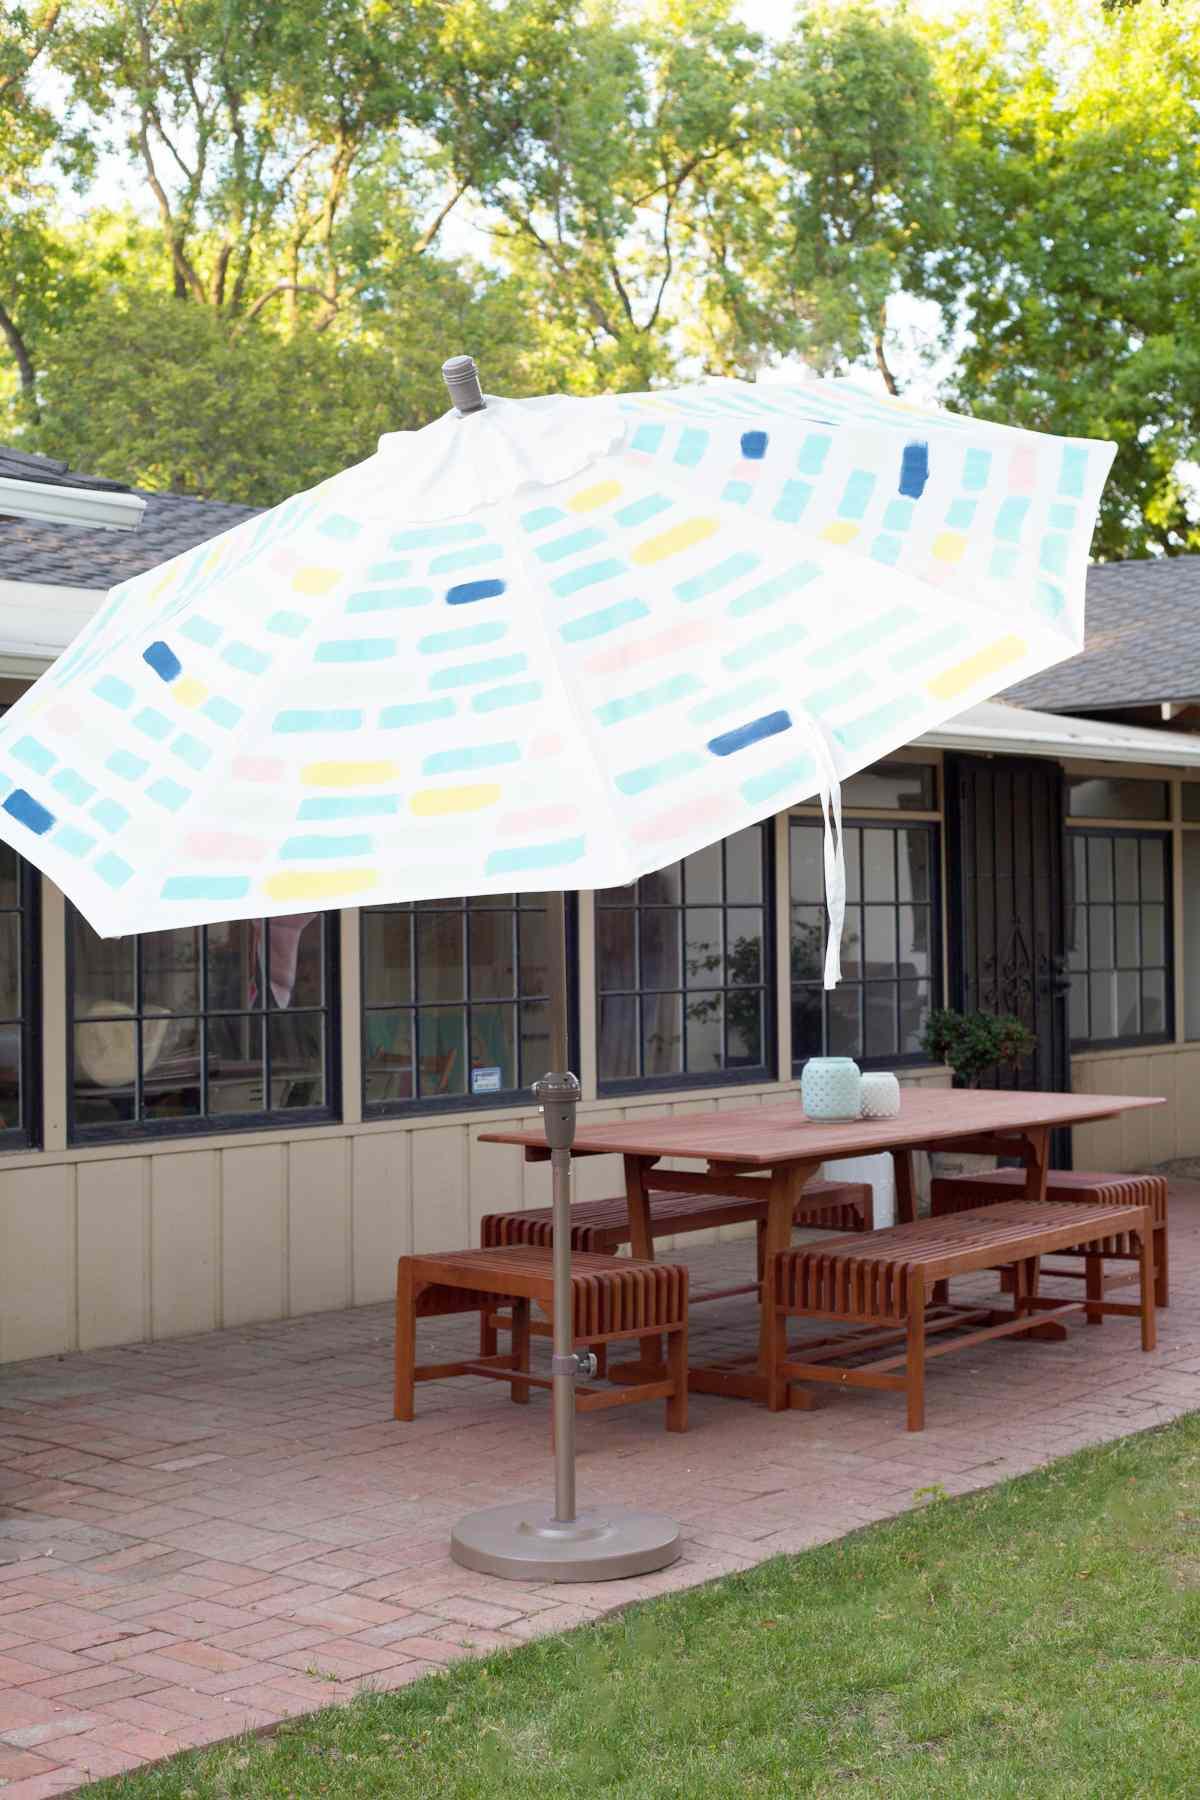 DIY Painted Patio Umbrella